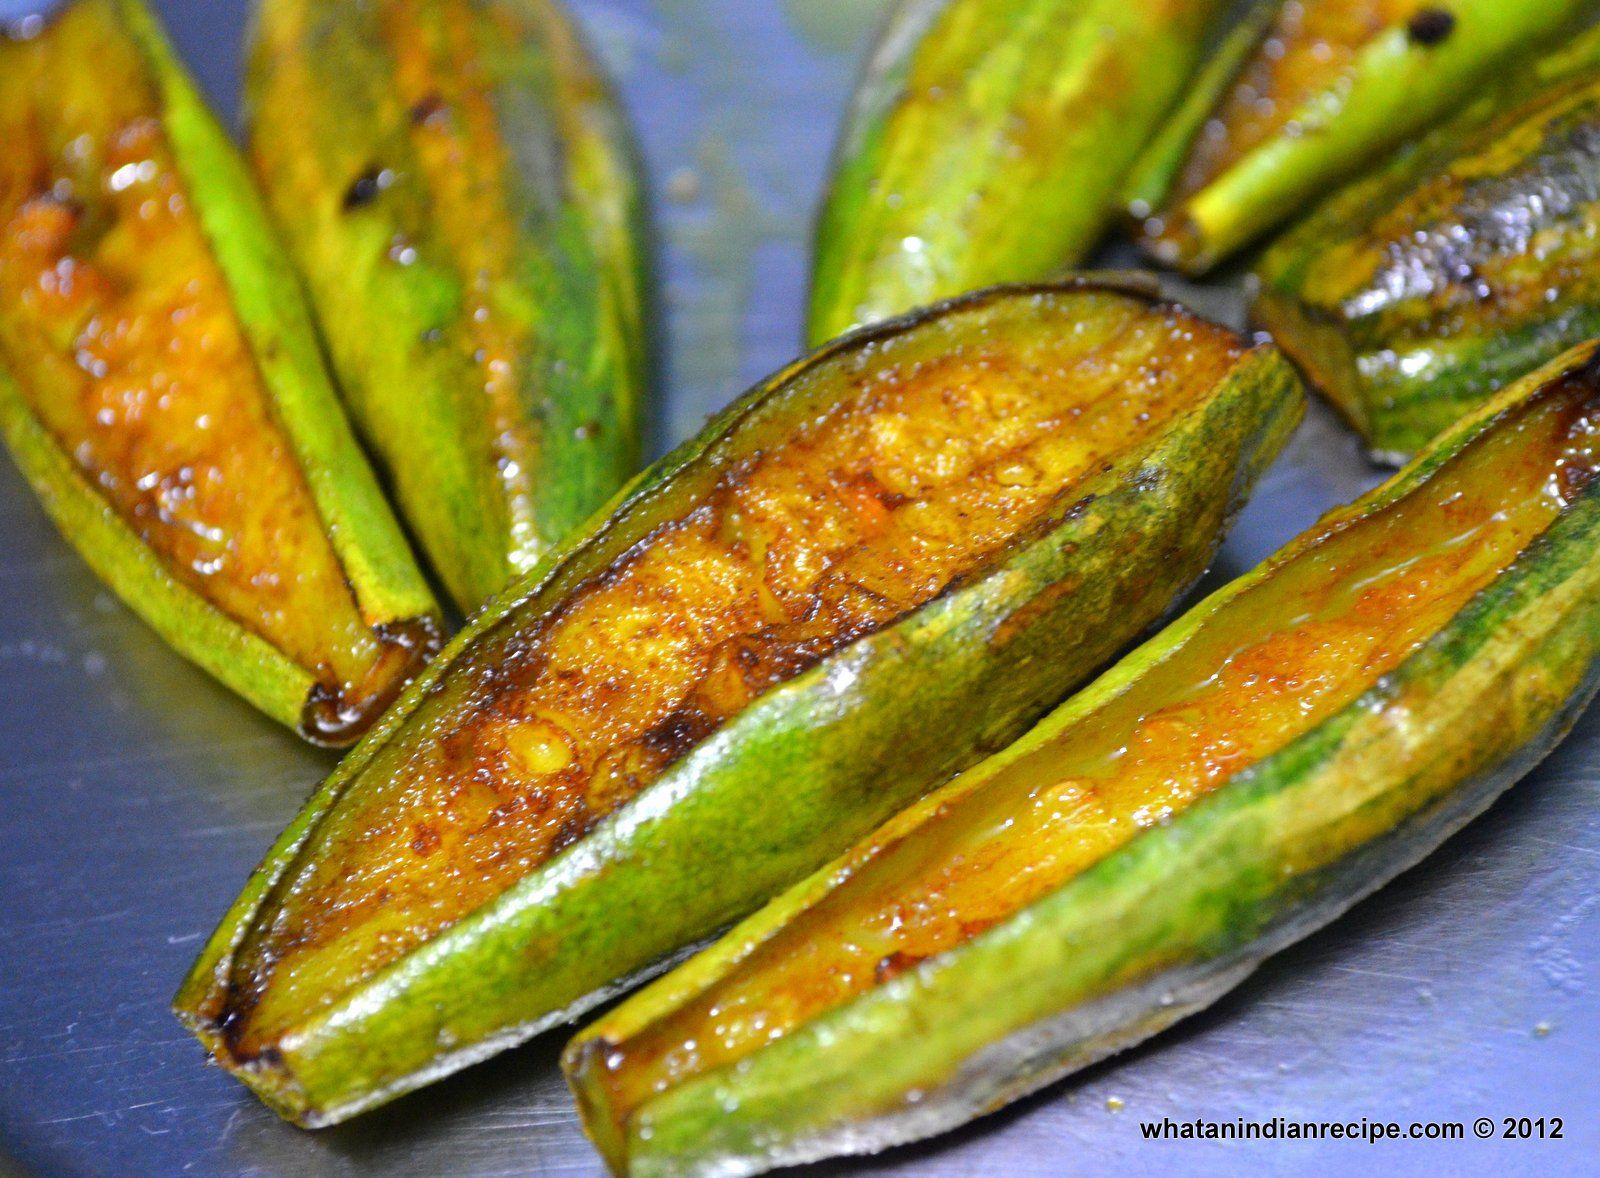 Potol bhaja recipe bengali food recipes pinterest bengali food potol bhaja recipe bengali foodindian forumfinder Image collections